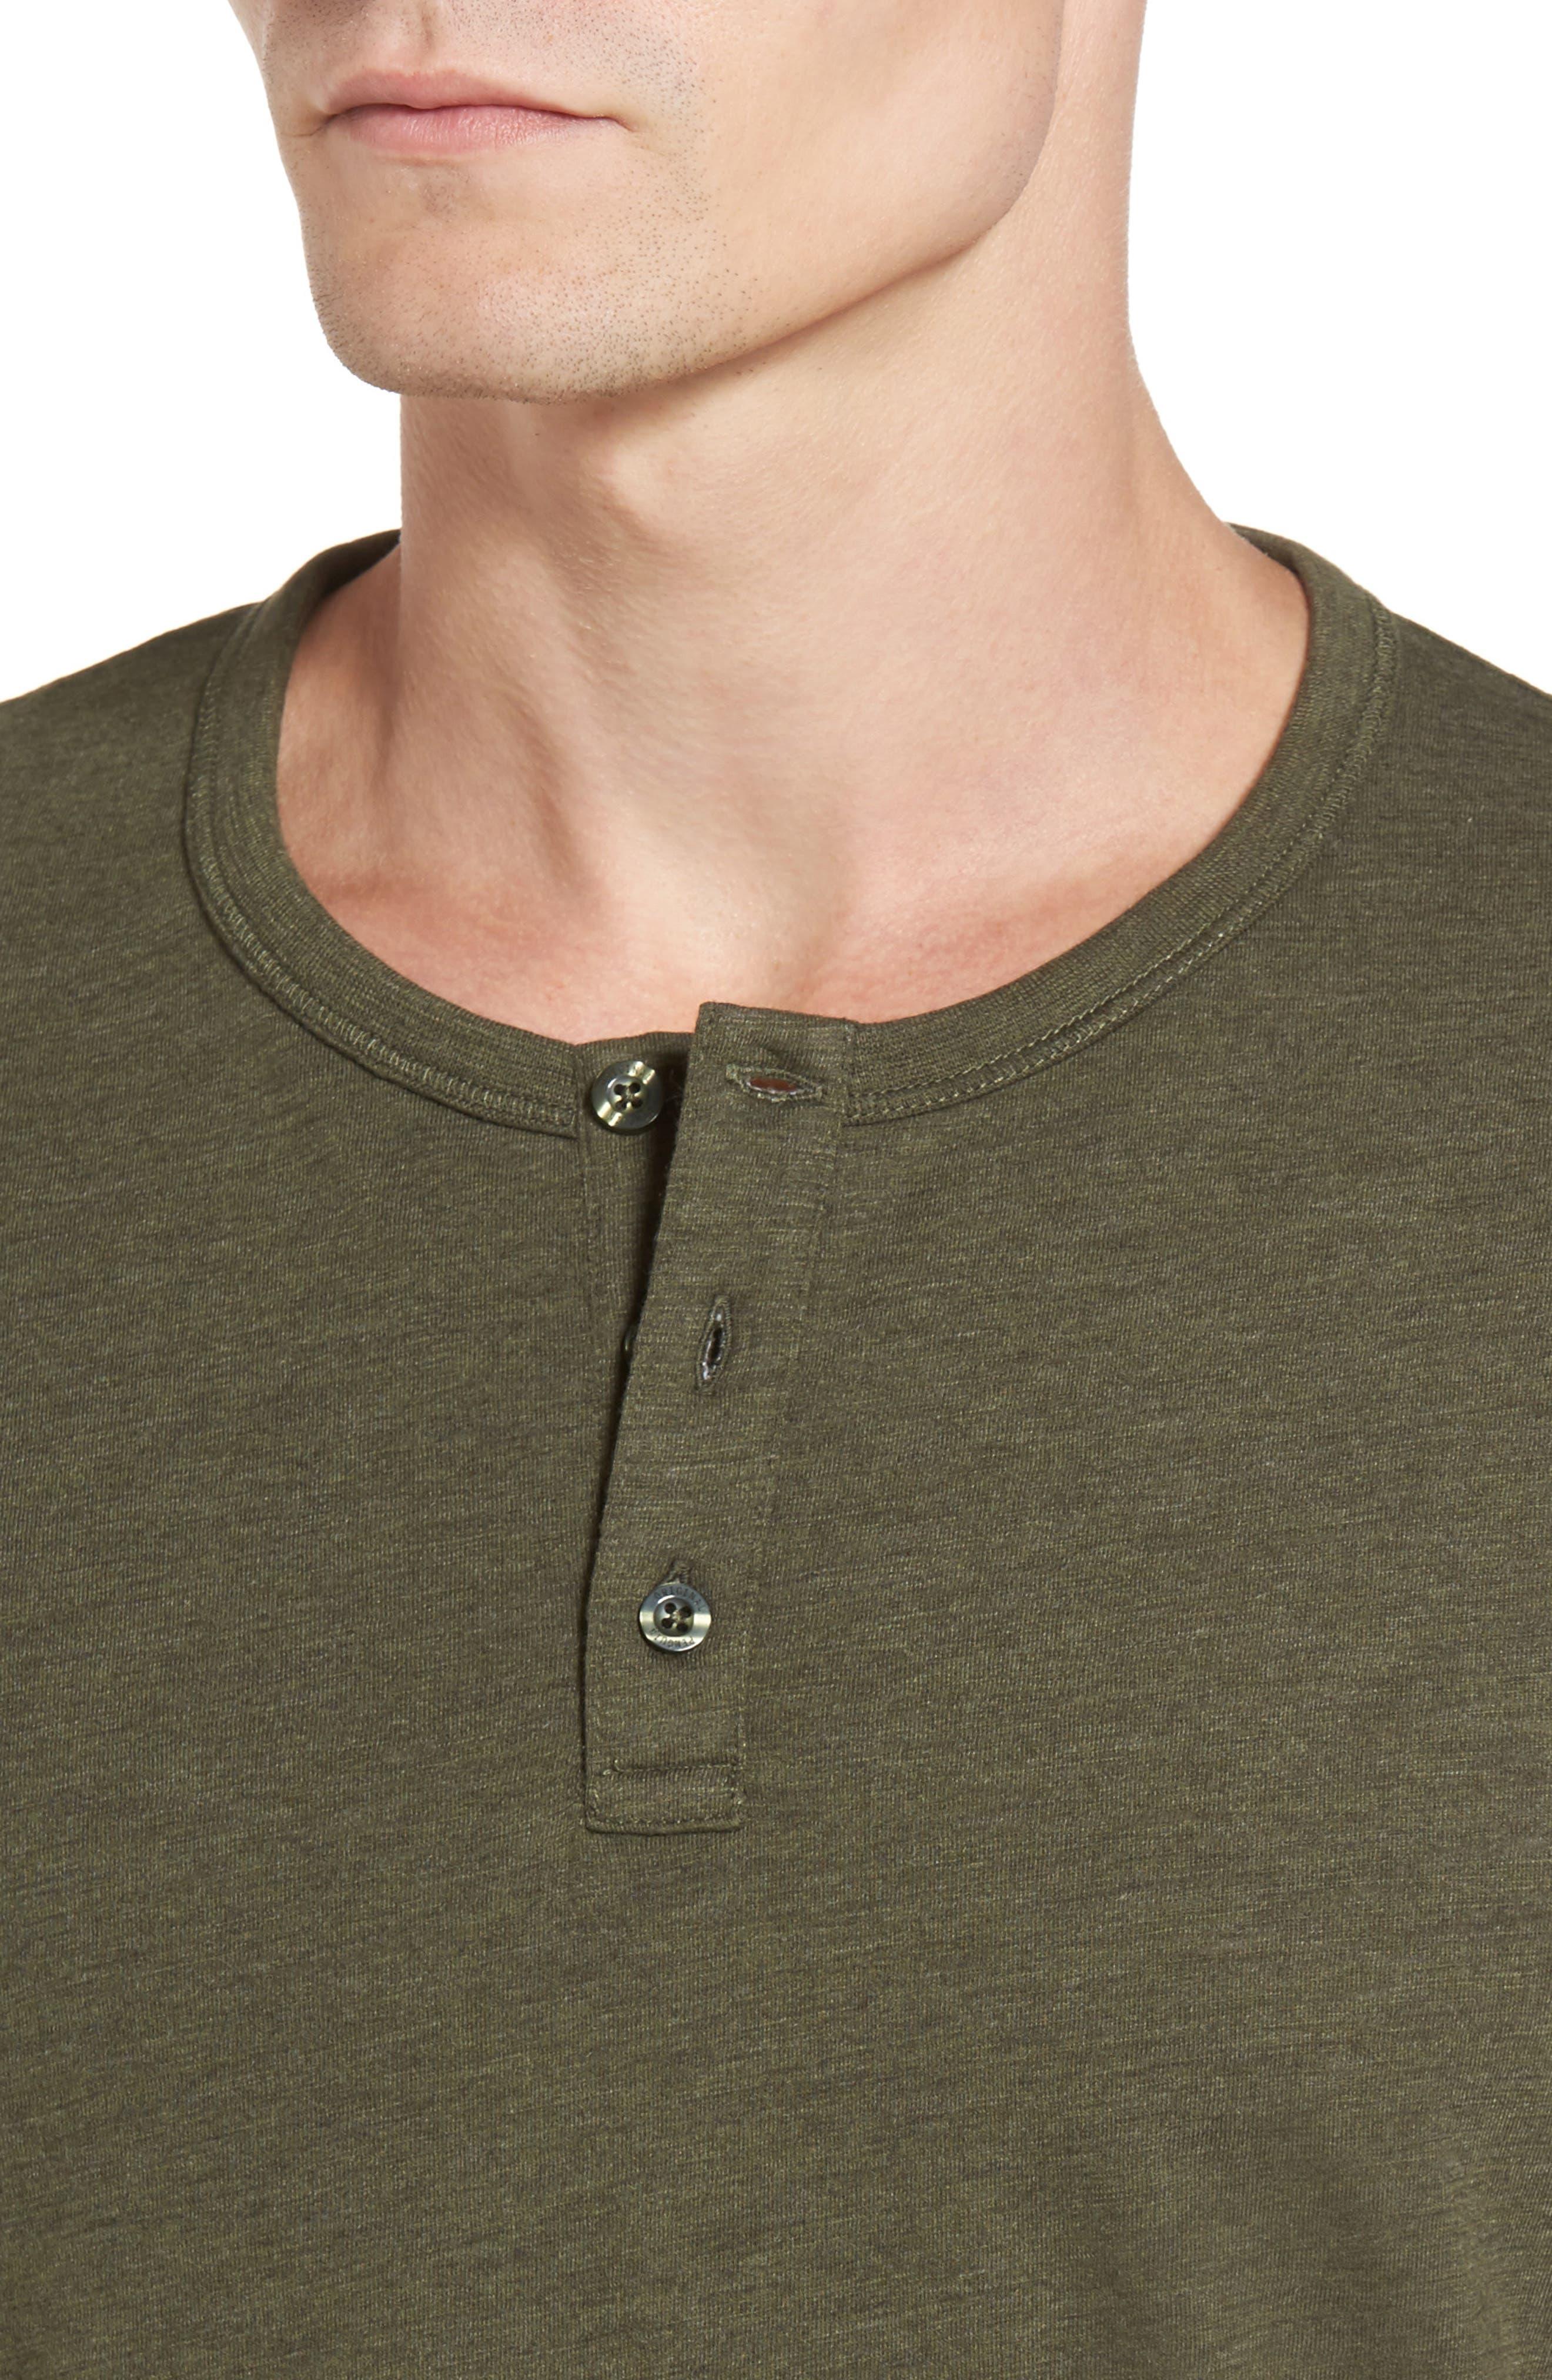 Bing Short Sleeve Henley Shirt,                             Alternate thumbnail 4, color,                             306